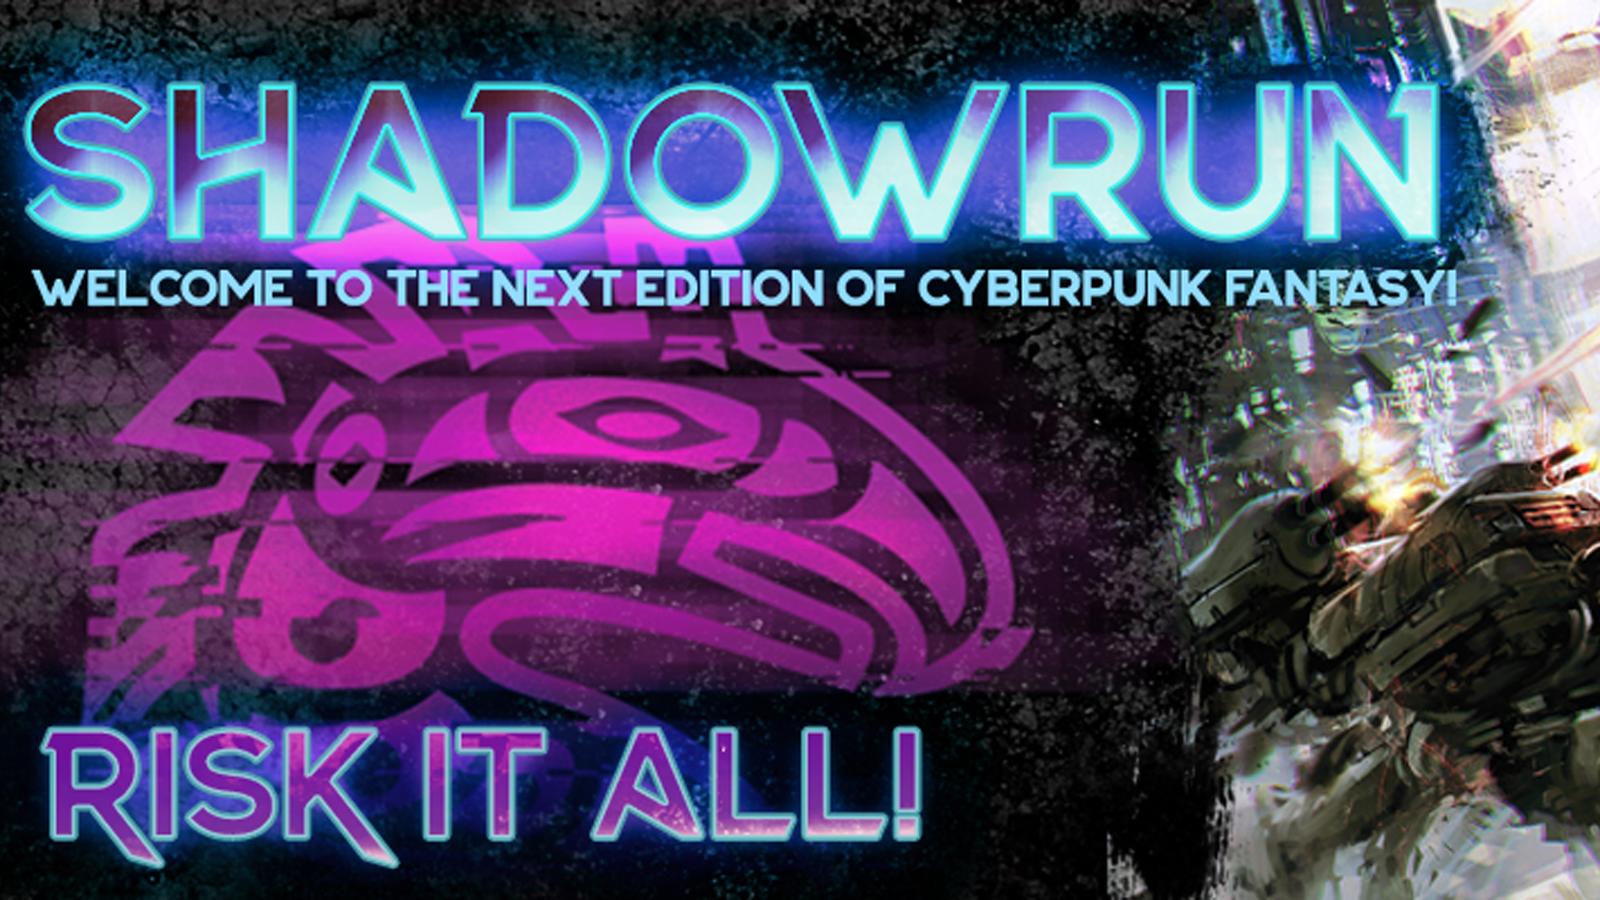 Shadowrun cyberpunk style art with neon lights on a dark background